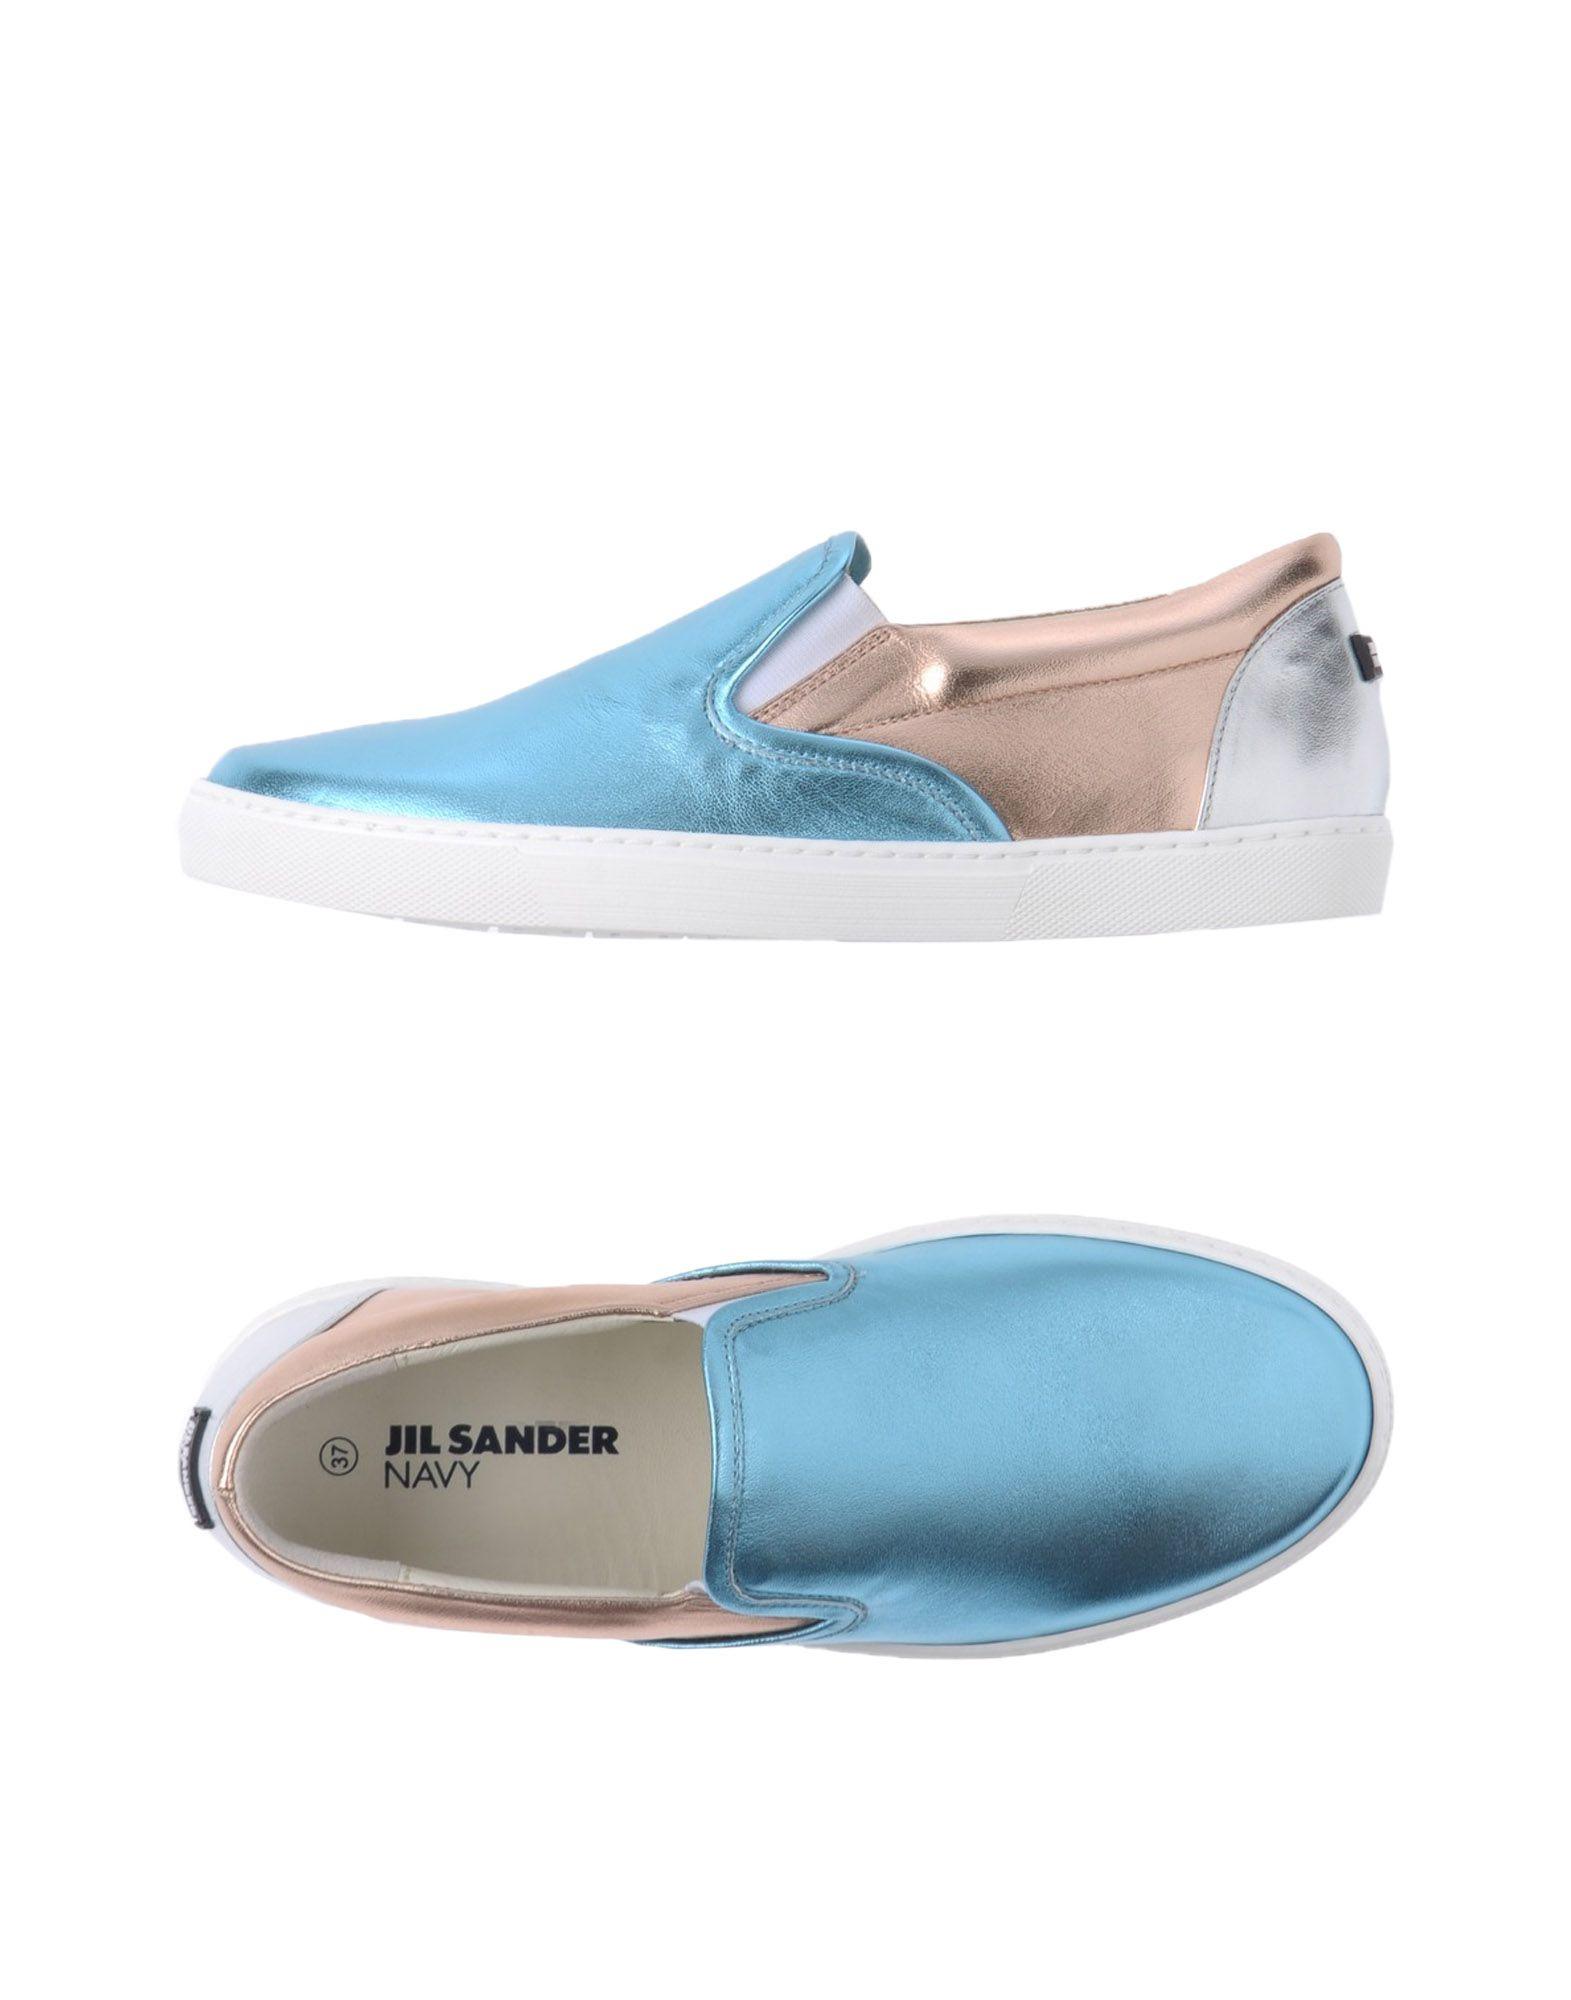 Jil Sander Navy Sneakers - Women Jil Sander Navy Australia Sneakers online on  Australia Navy - 11174377TG c0279c